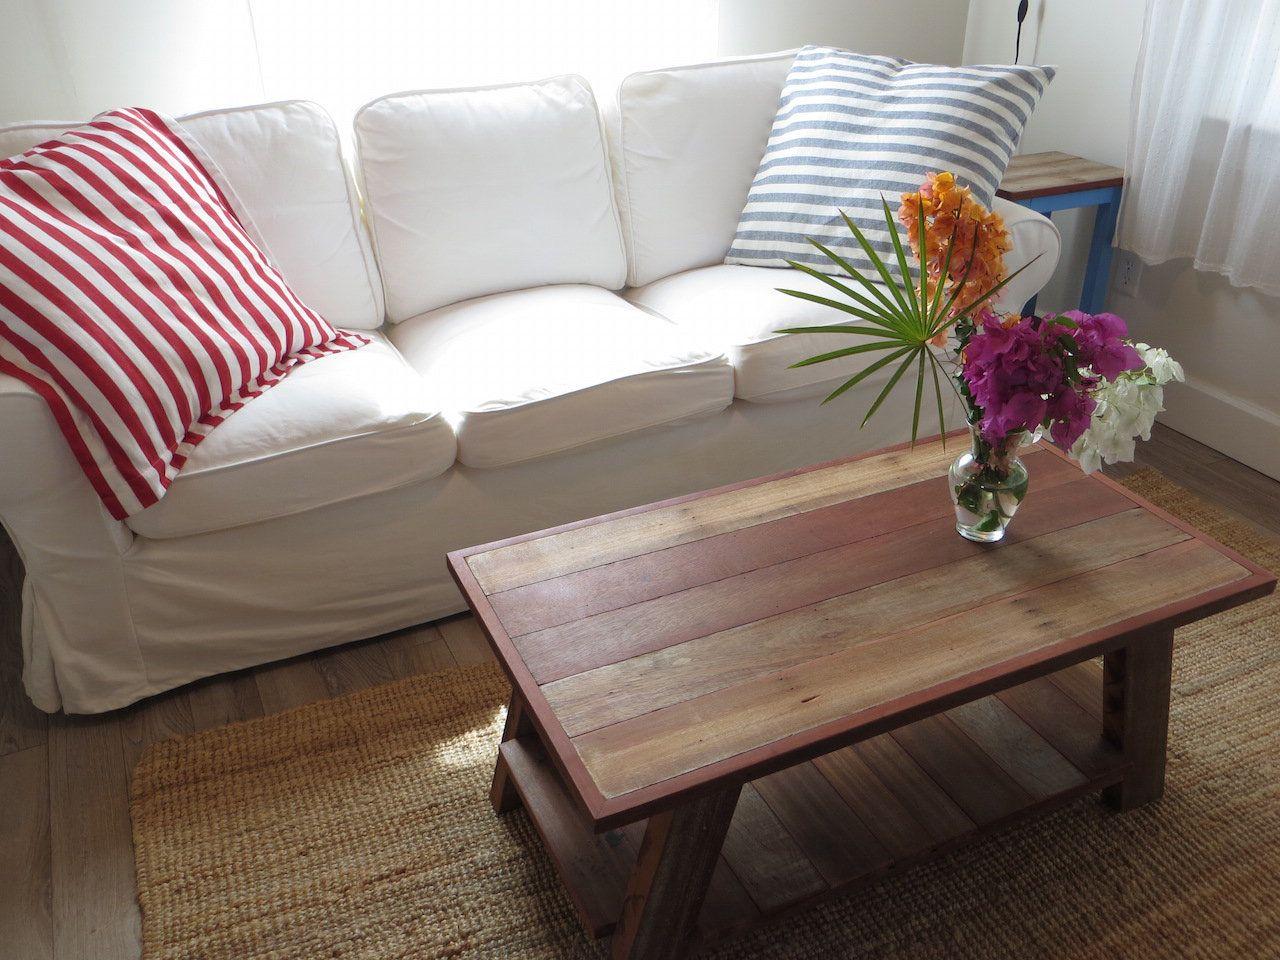 Long Island Bahamas Ikea Wood Table Custom Furniture Ipe Wood Home Bahamas Real Estate Long Island Bahamas [ 960 x 1280 Pixel ]